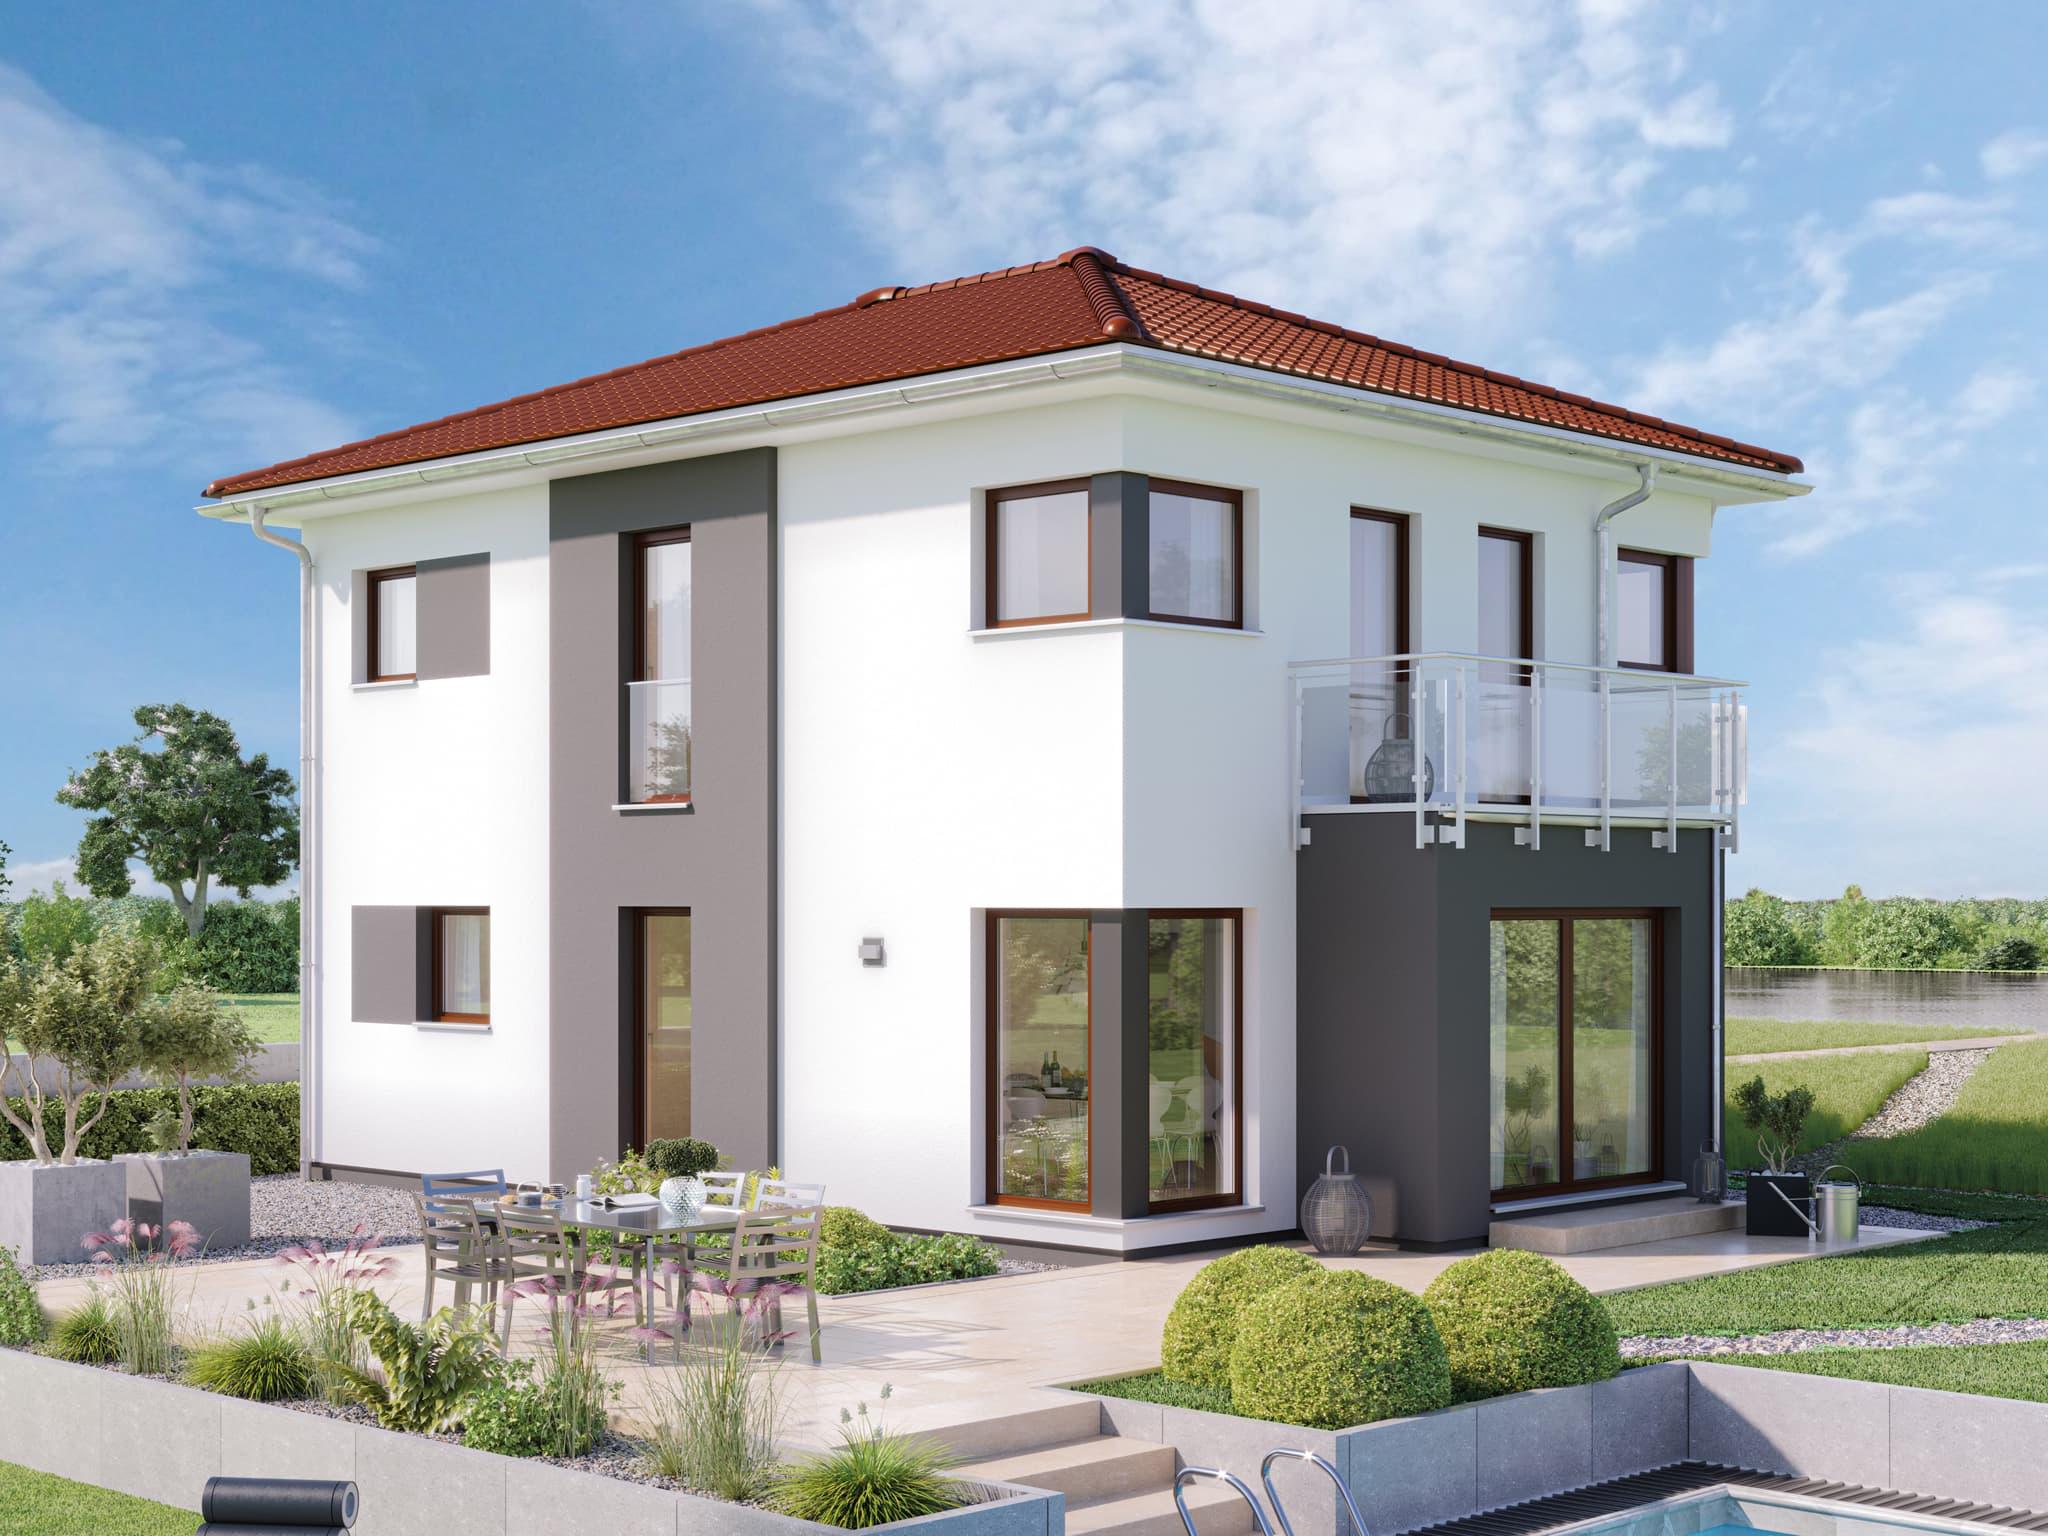 Neubau Stadtvilla modern mit Walmdach, Erker & Balkon, 5 Zimmer, 120 qm - Haus bauen Ideen Bien Zenker Fertighaus EDITION 123 V5 - HausbauDirekt.de